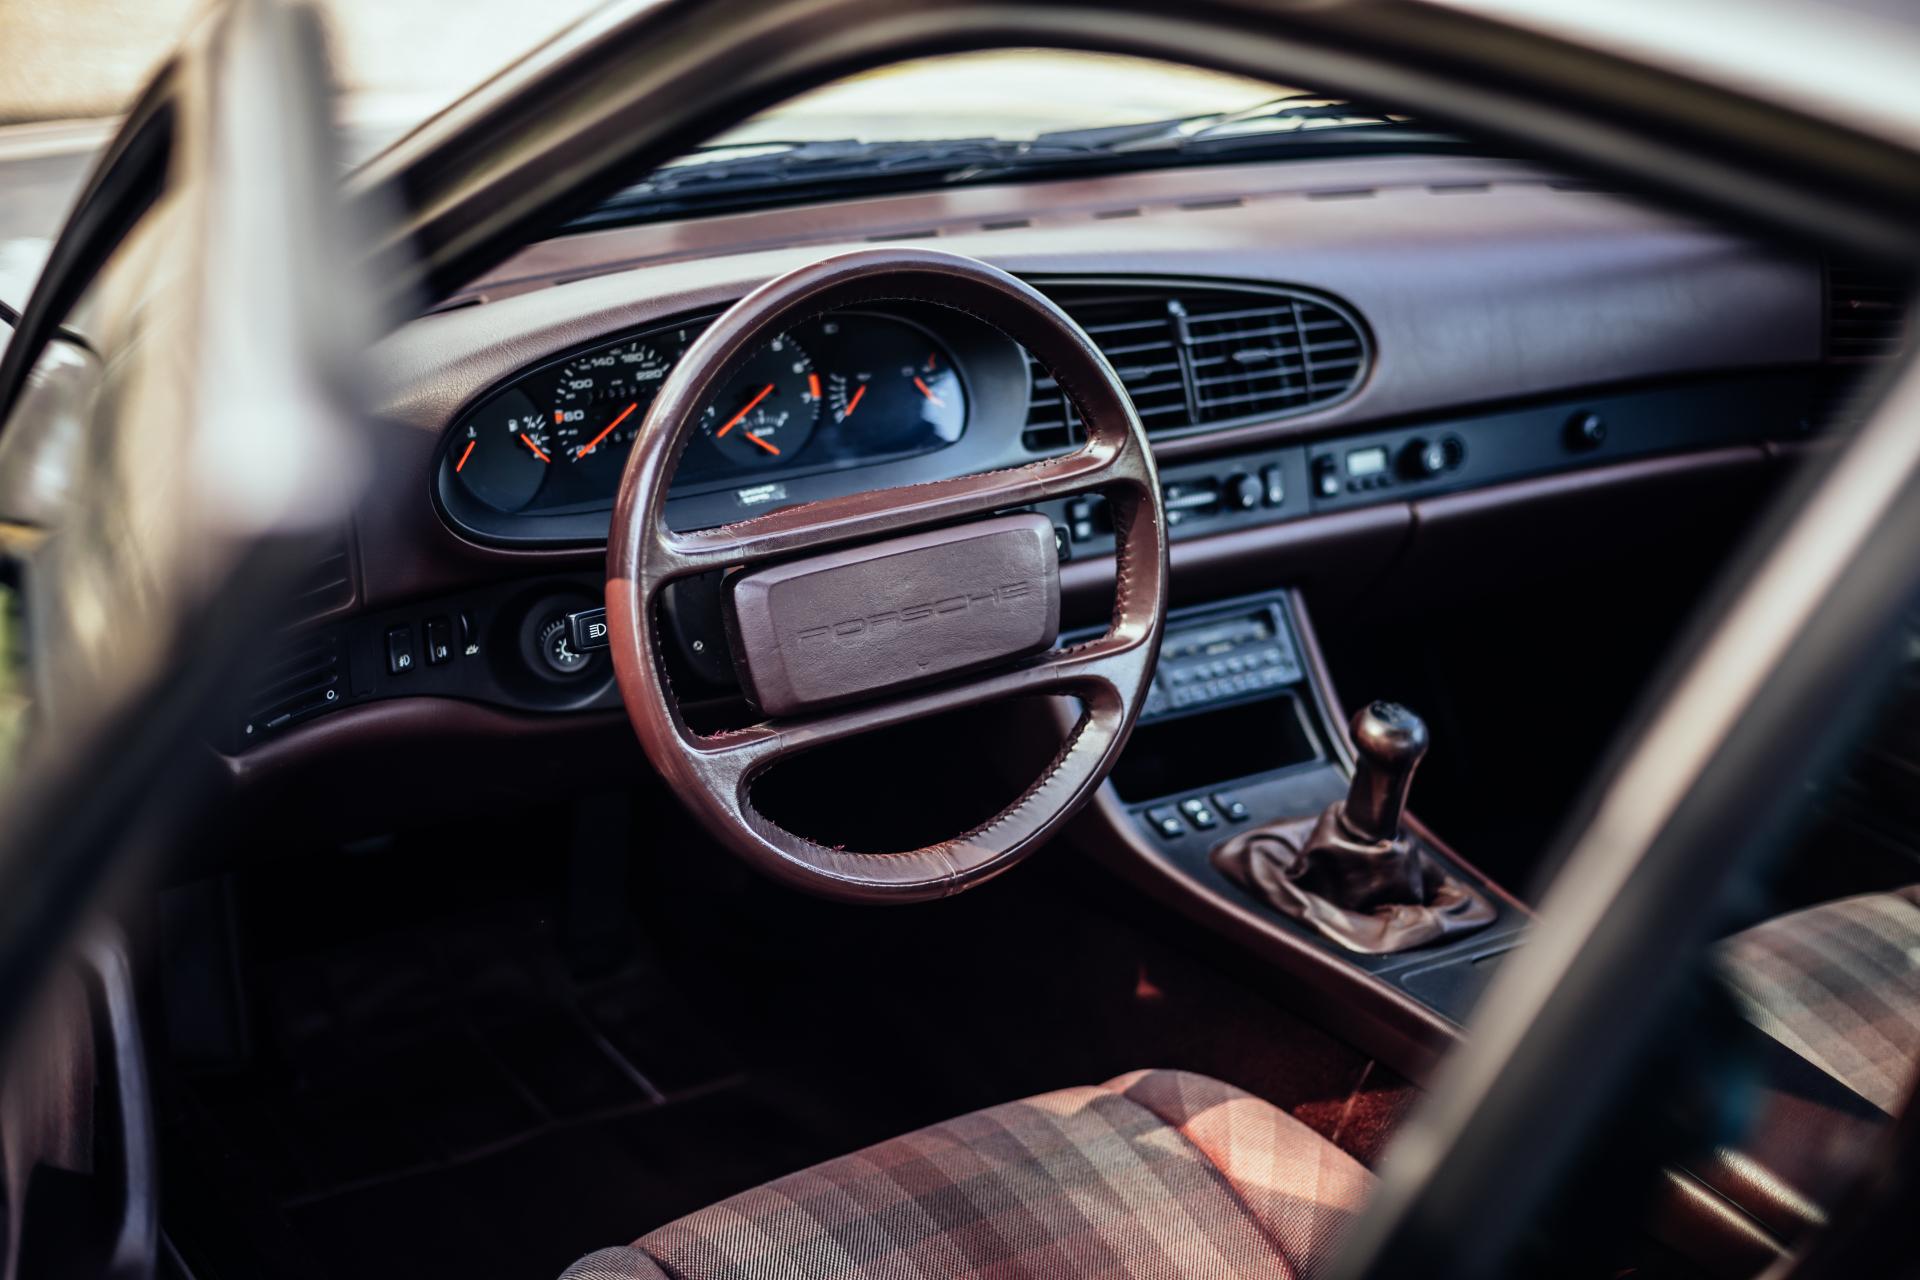 Porsche 944 Turbo S - Innenraum